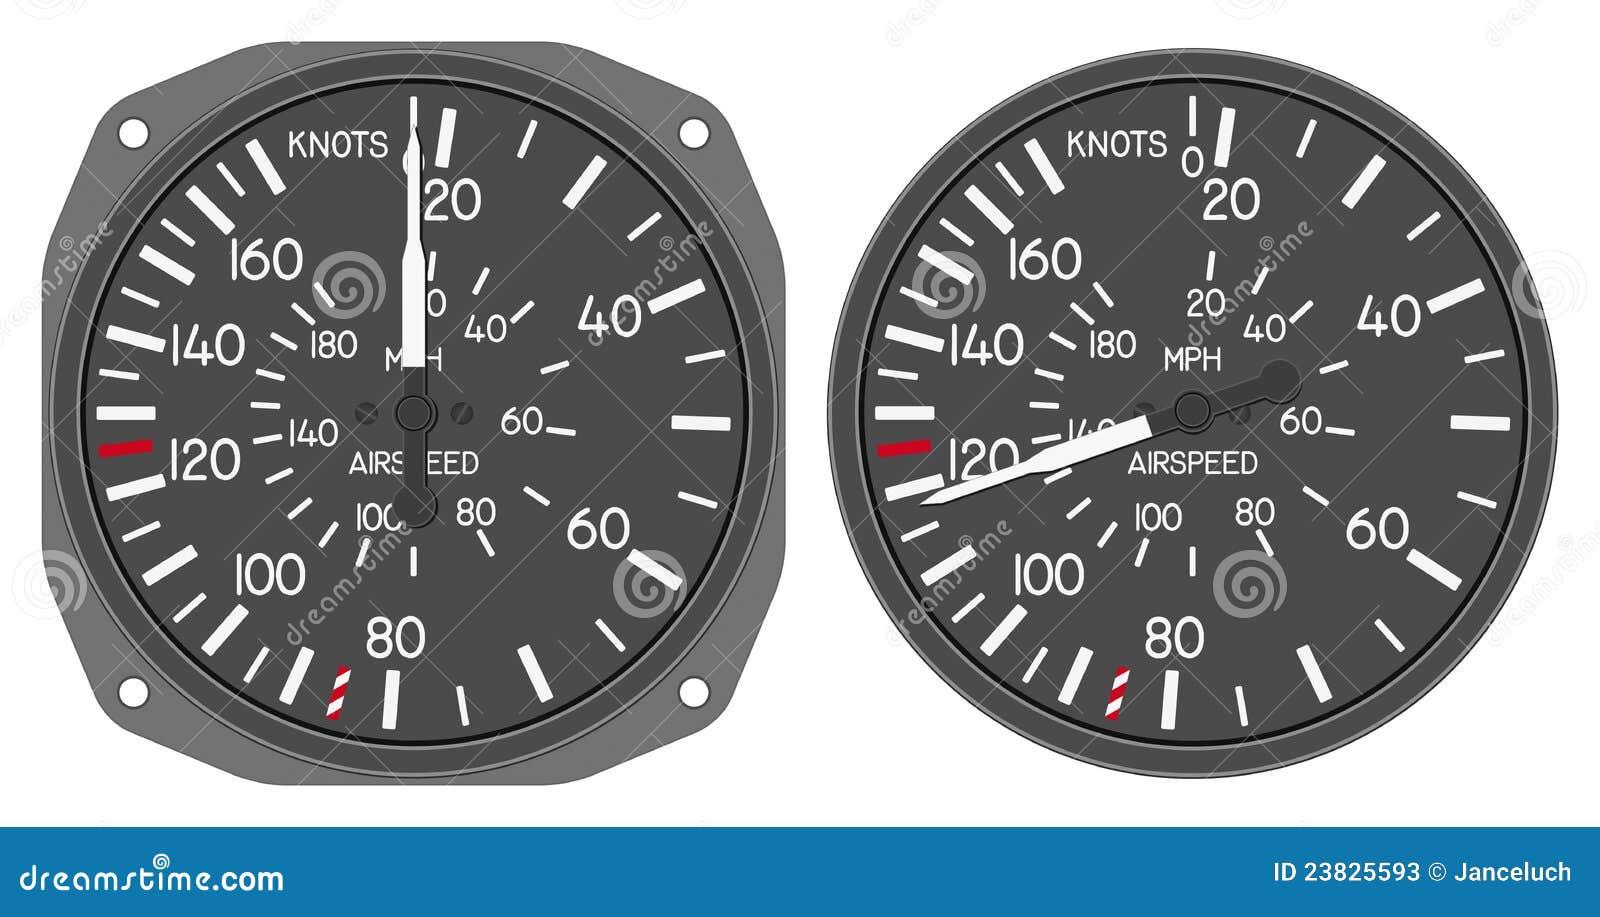 Aircraft Indicators 5 - 480B Dashboard Set Stock